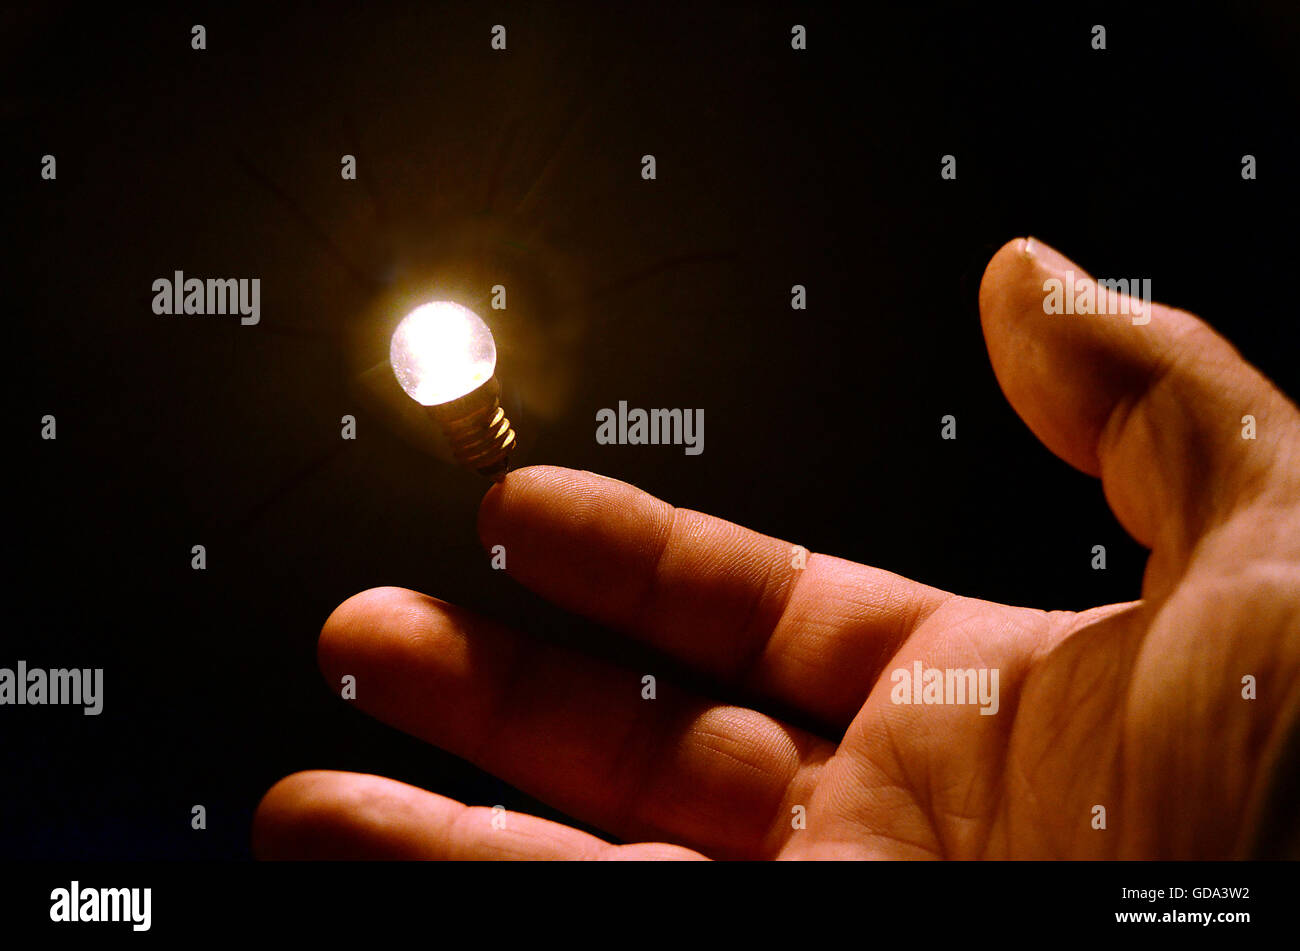 A light bulb seems to balance on a human finger. - Stock Image